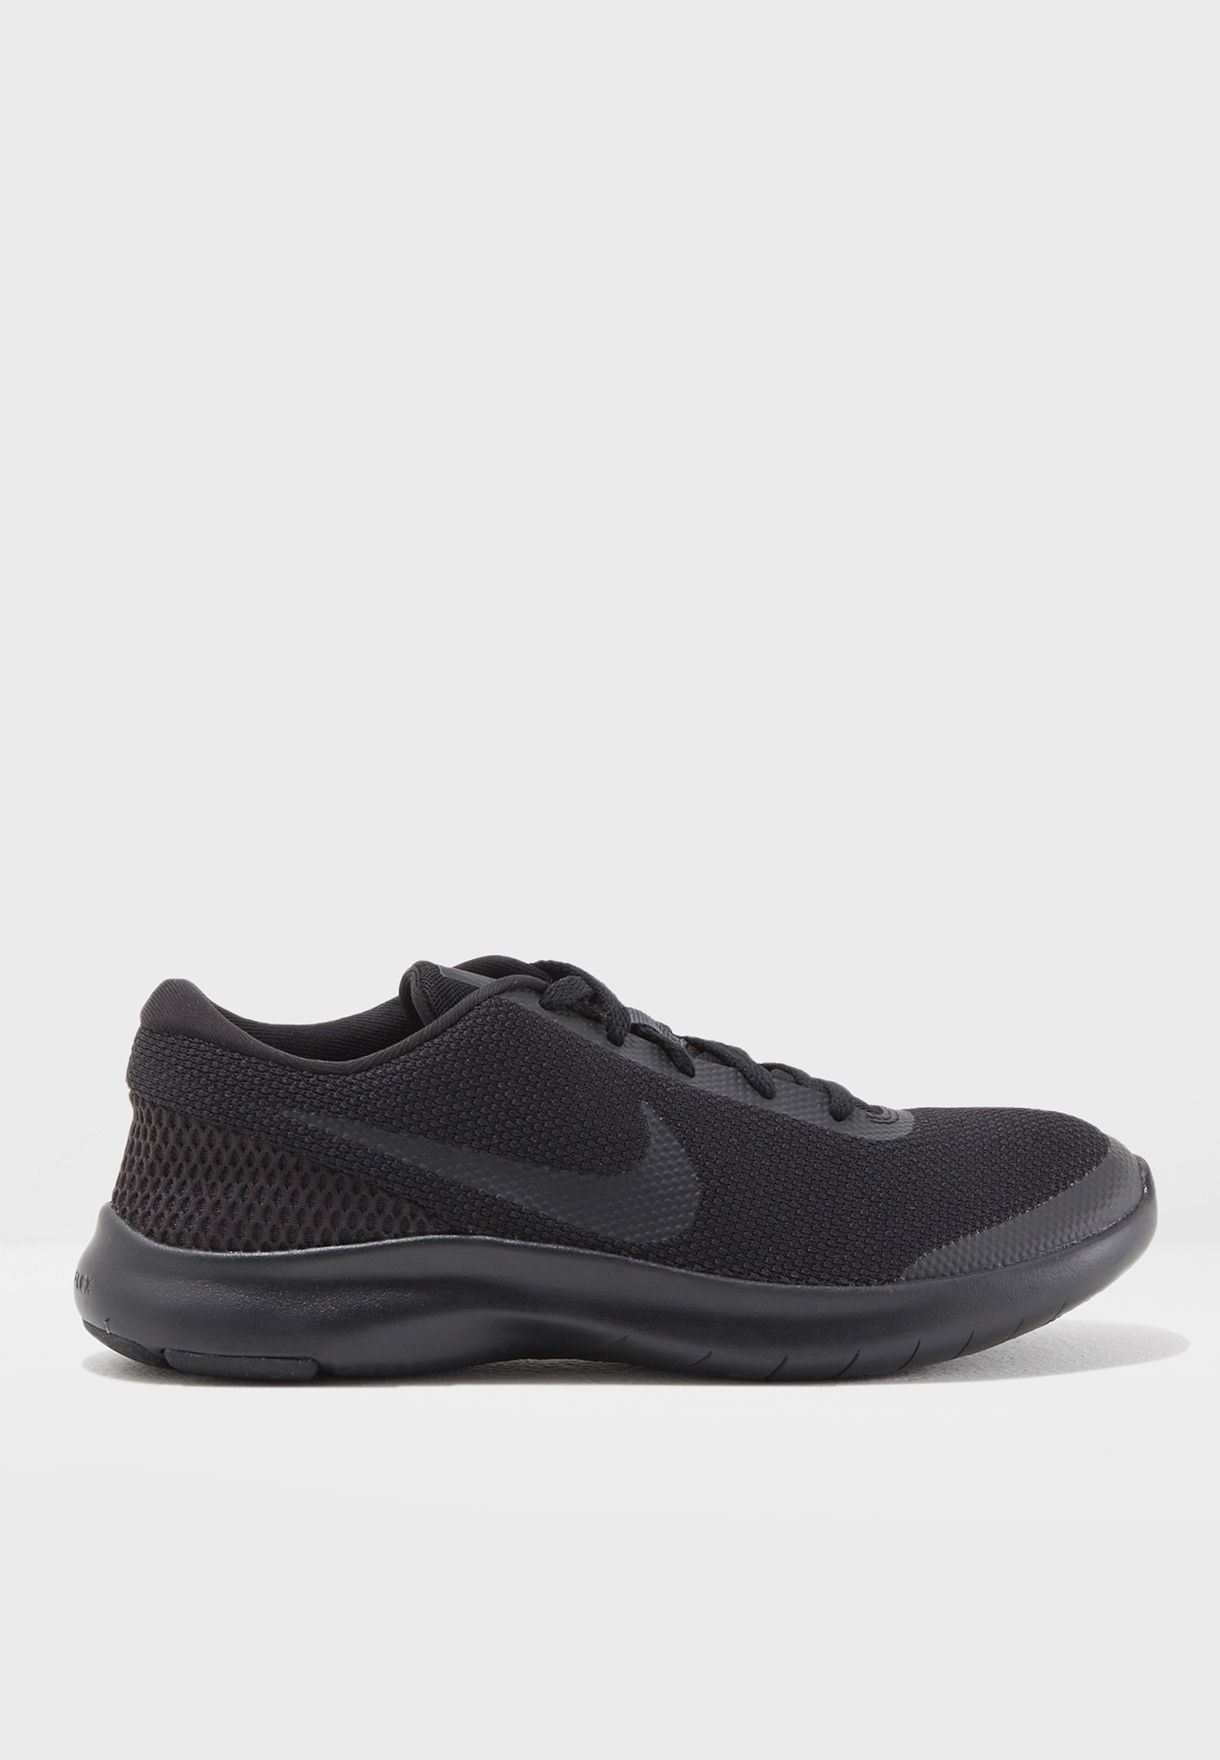 12c69e3f6bbe5 Shop Nike black Flex Experience RN 7 908996-002 for Women in UAE ...